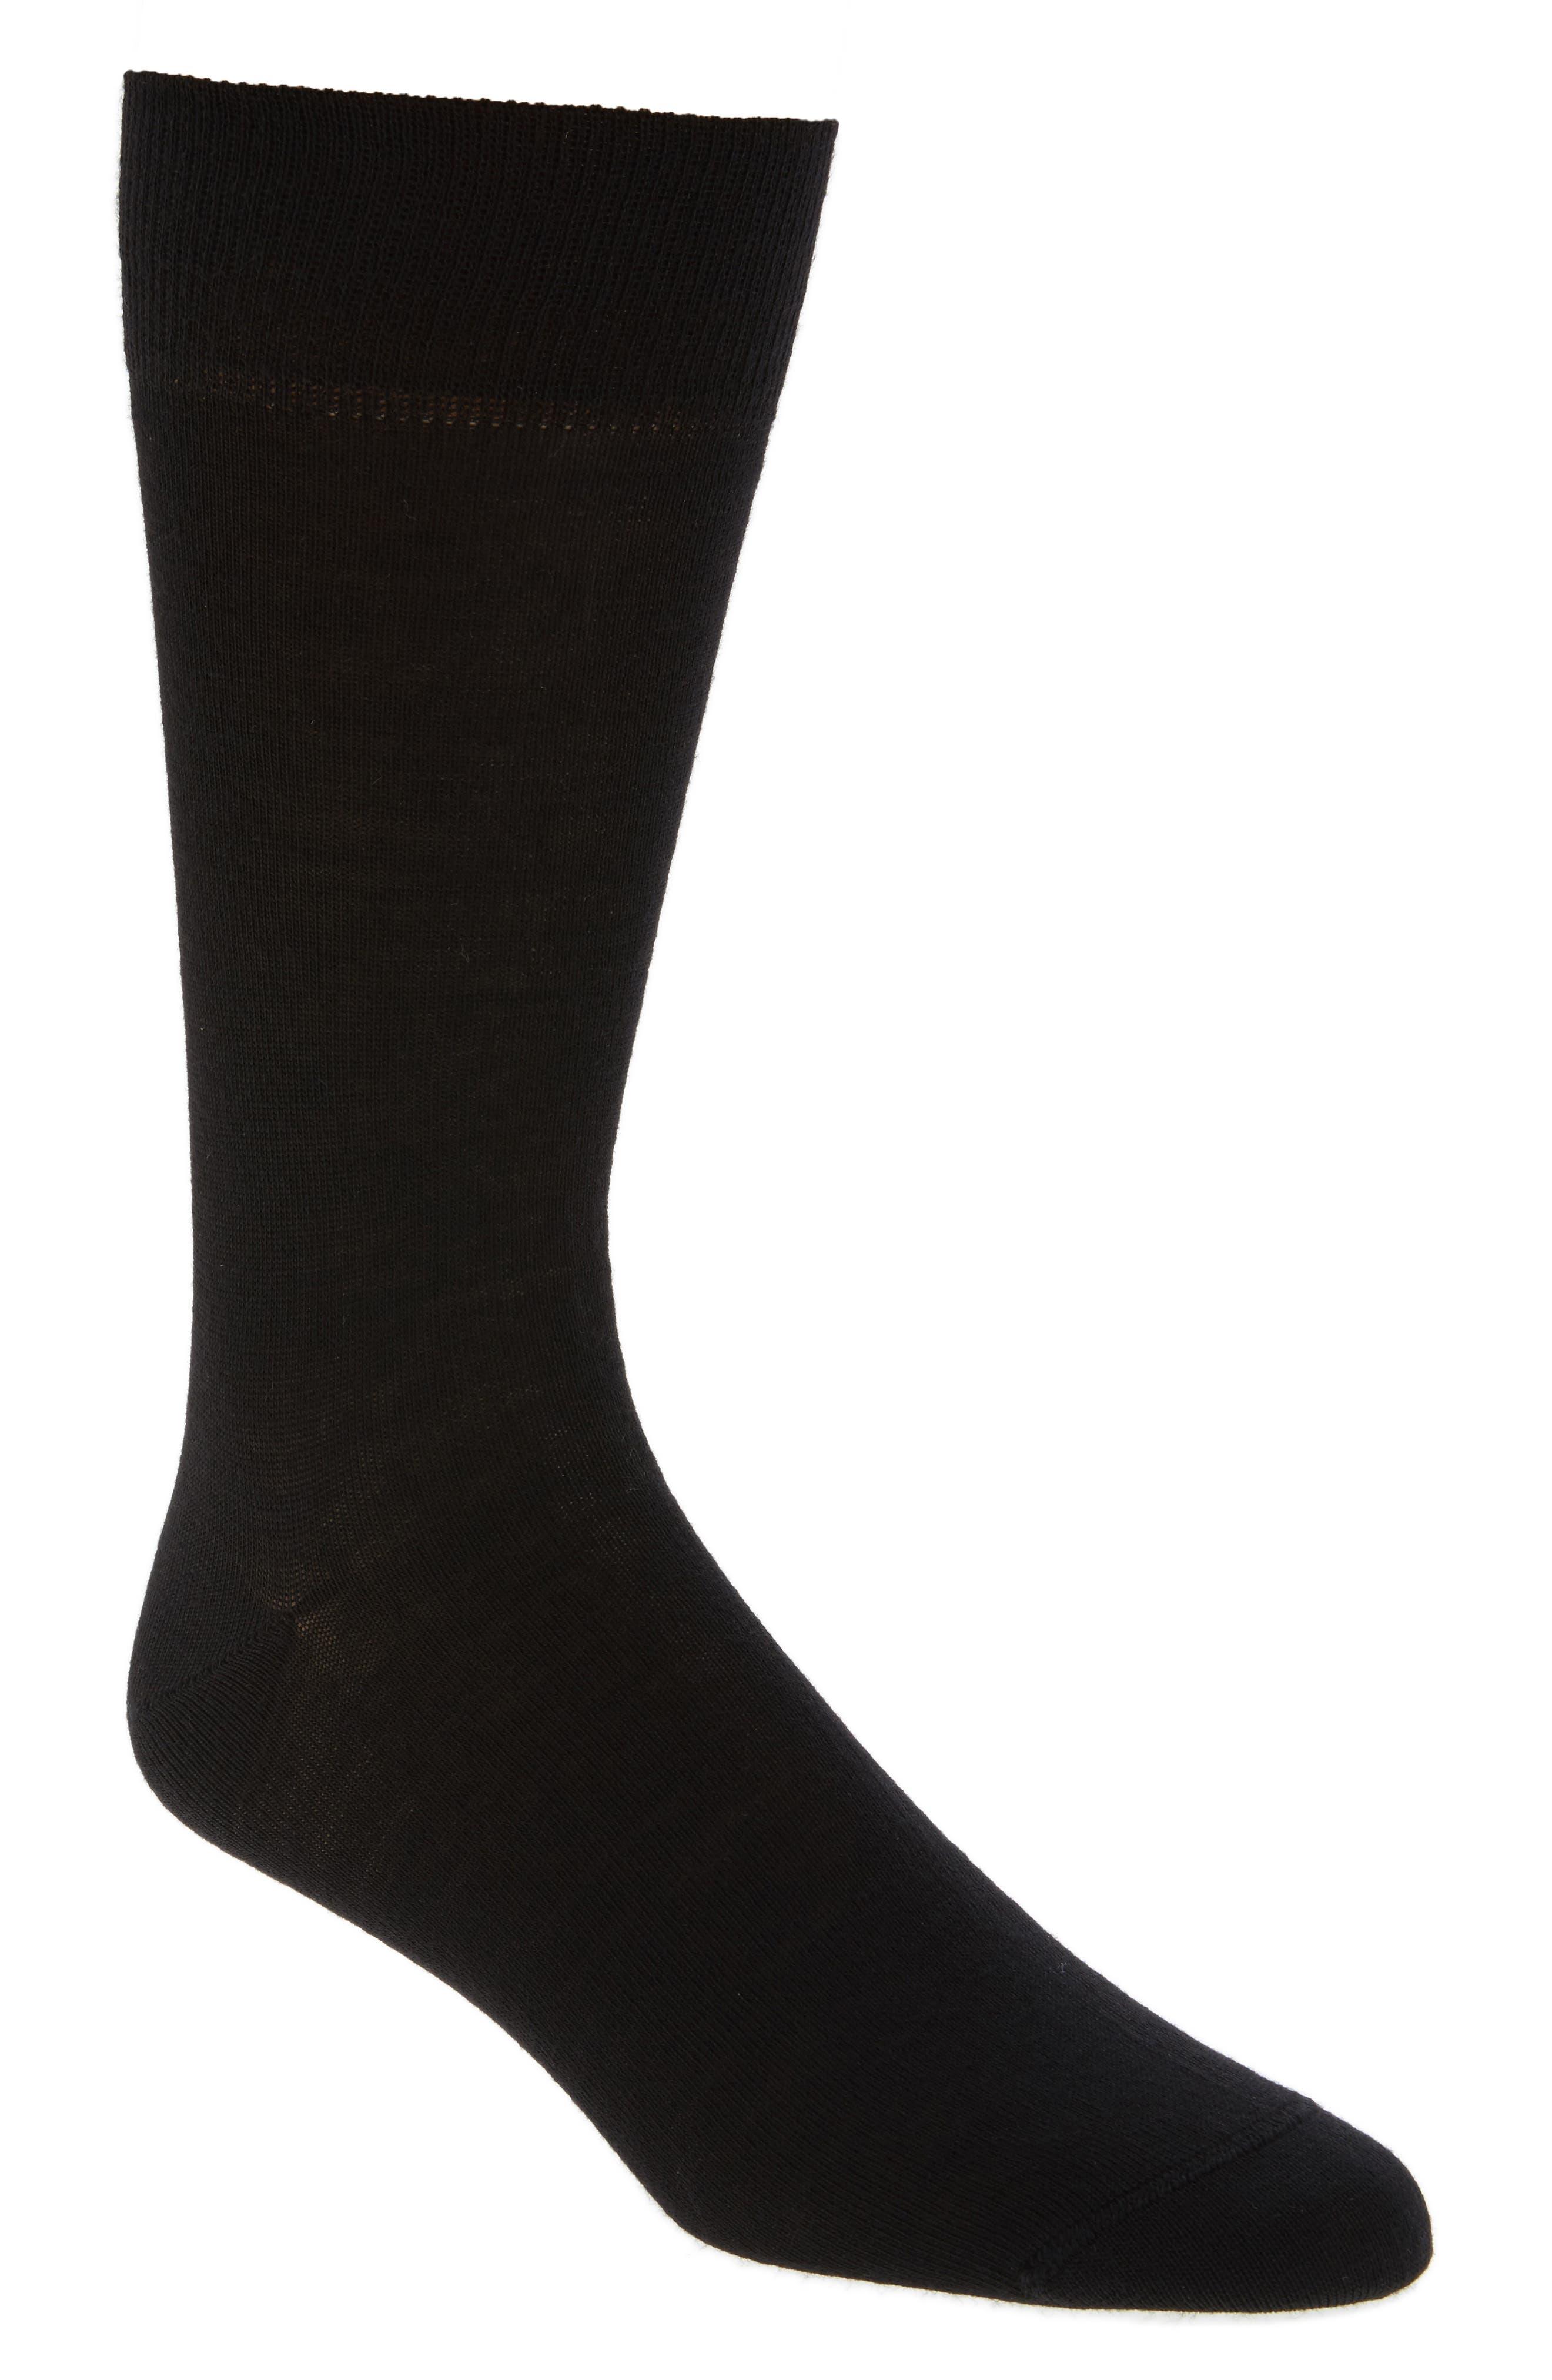 Merino Wool Blend Socks,                         Main,                         color, 001